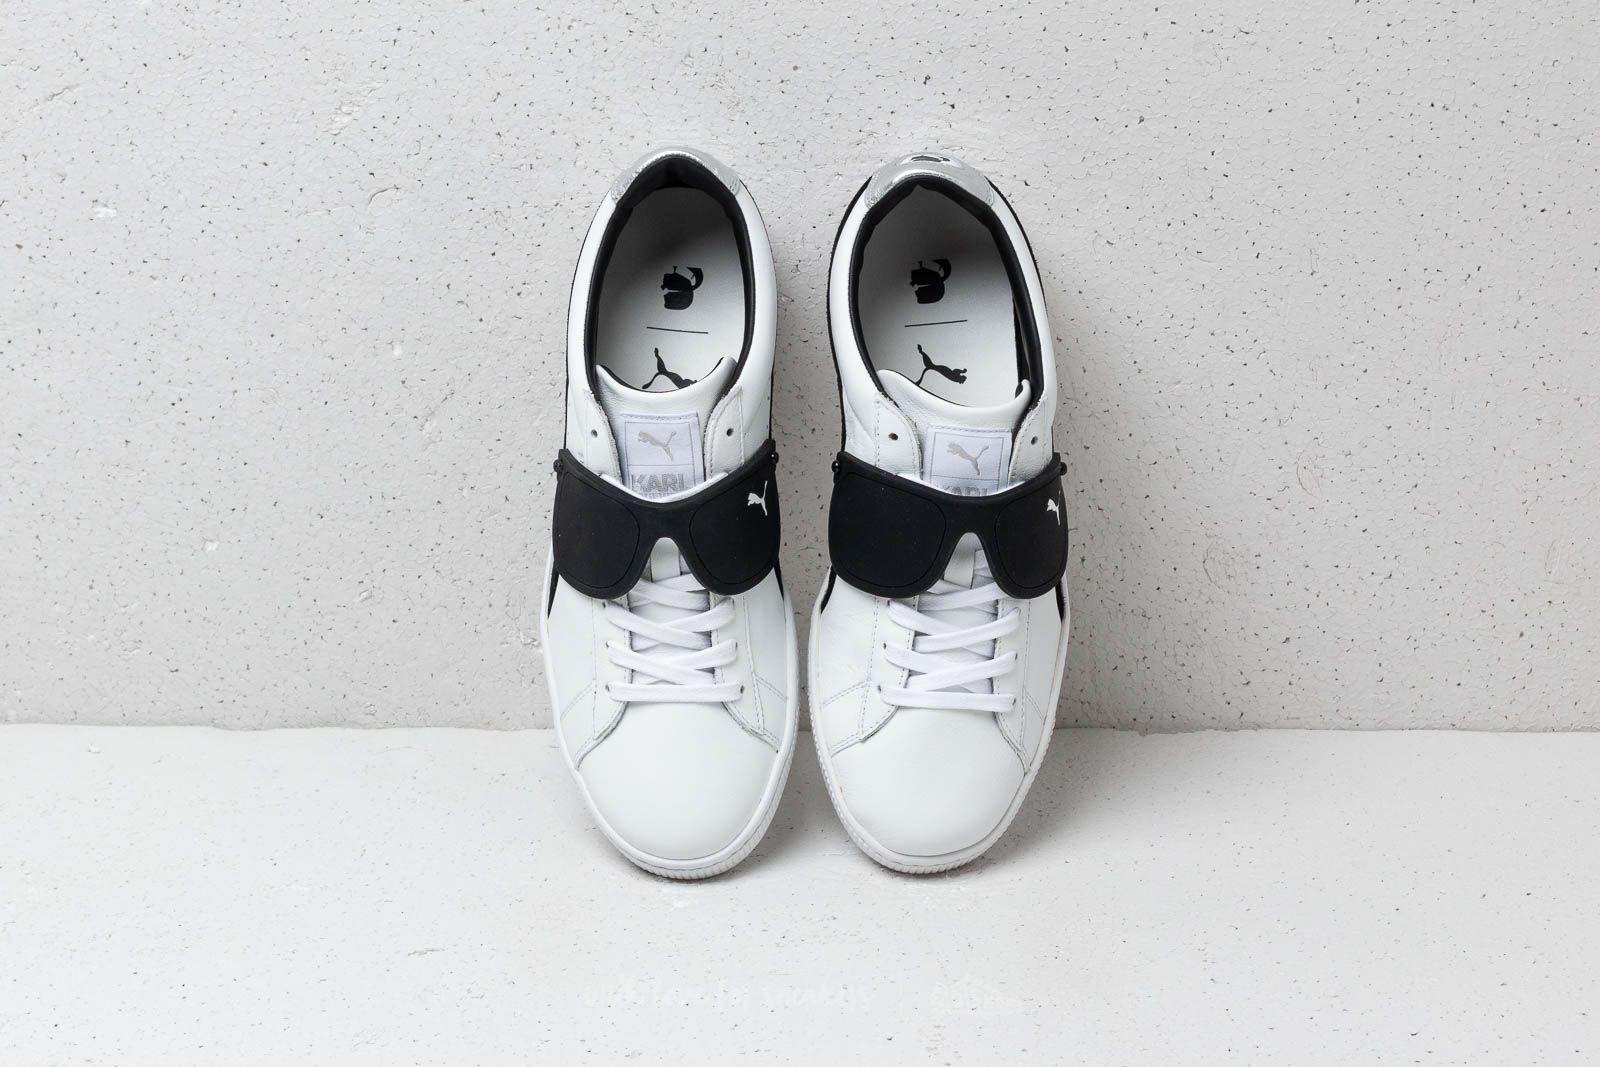 BlackFootshop Suede Karl Puma Lagerfeld X Classic White 0mnN8w